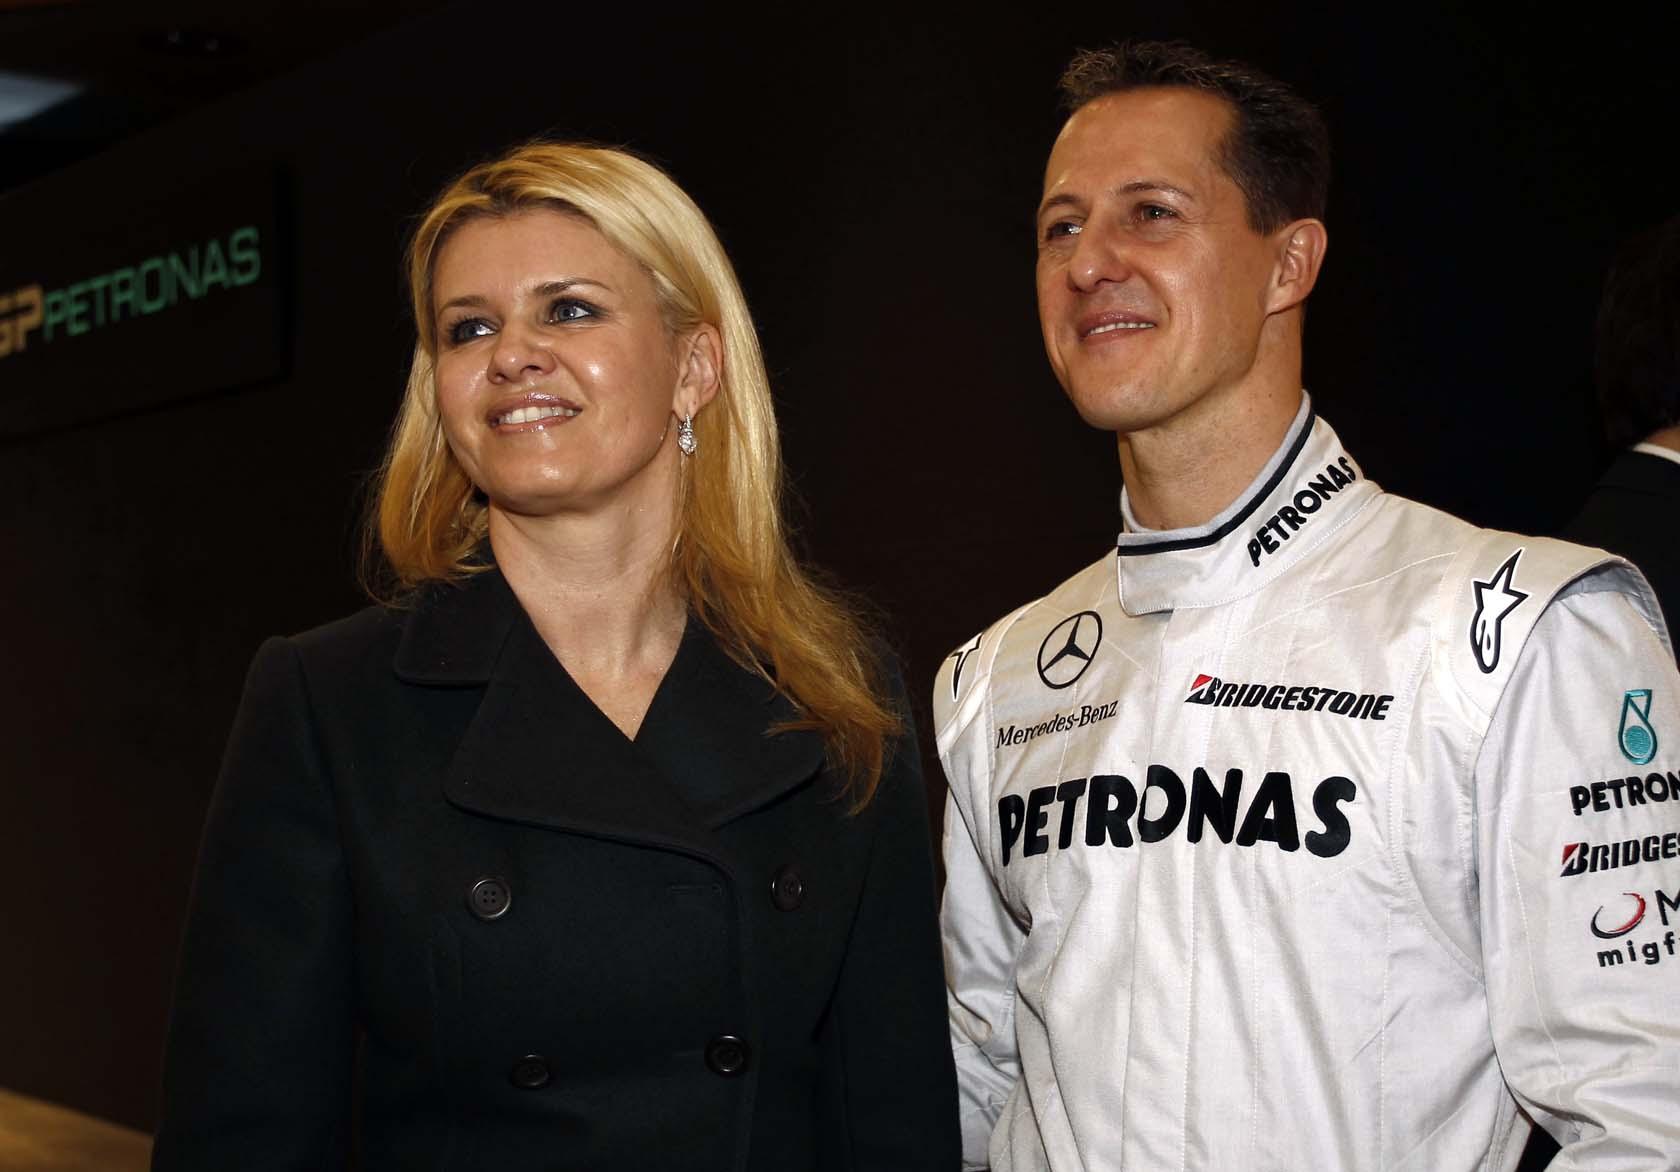 Motorsports / Formula 1: Mercedes GP Petronas Car Launch